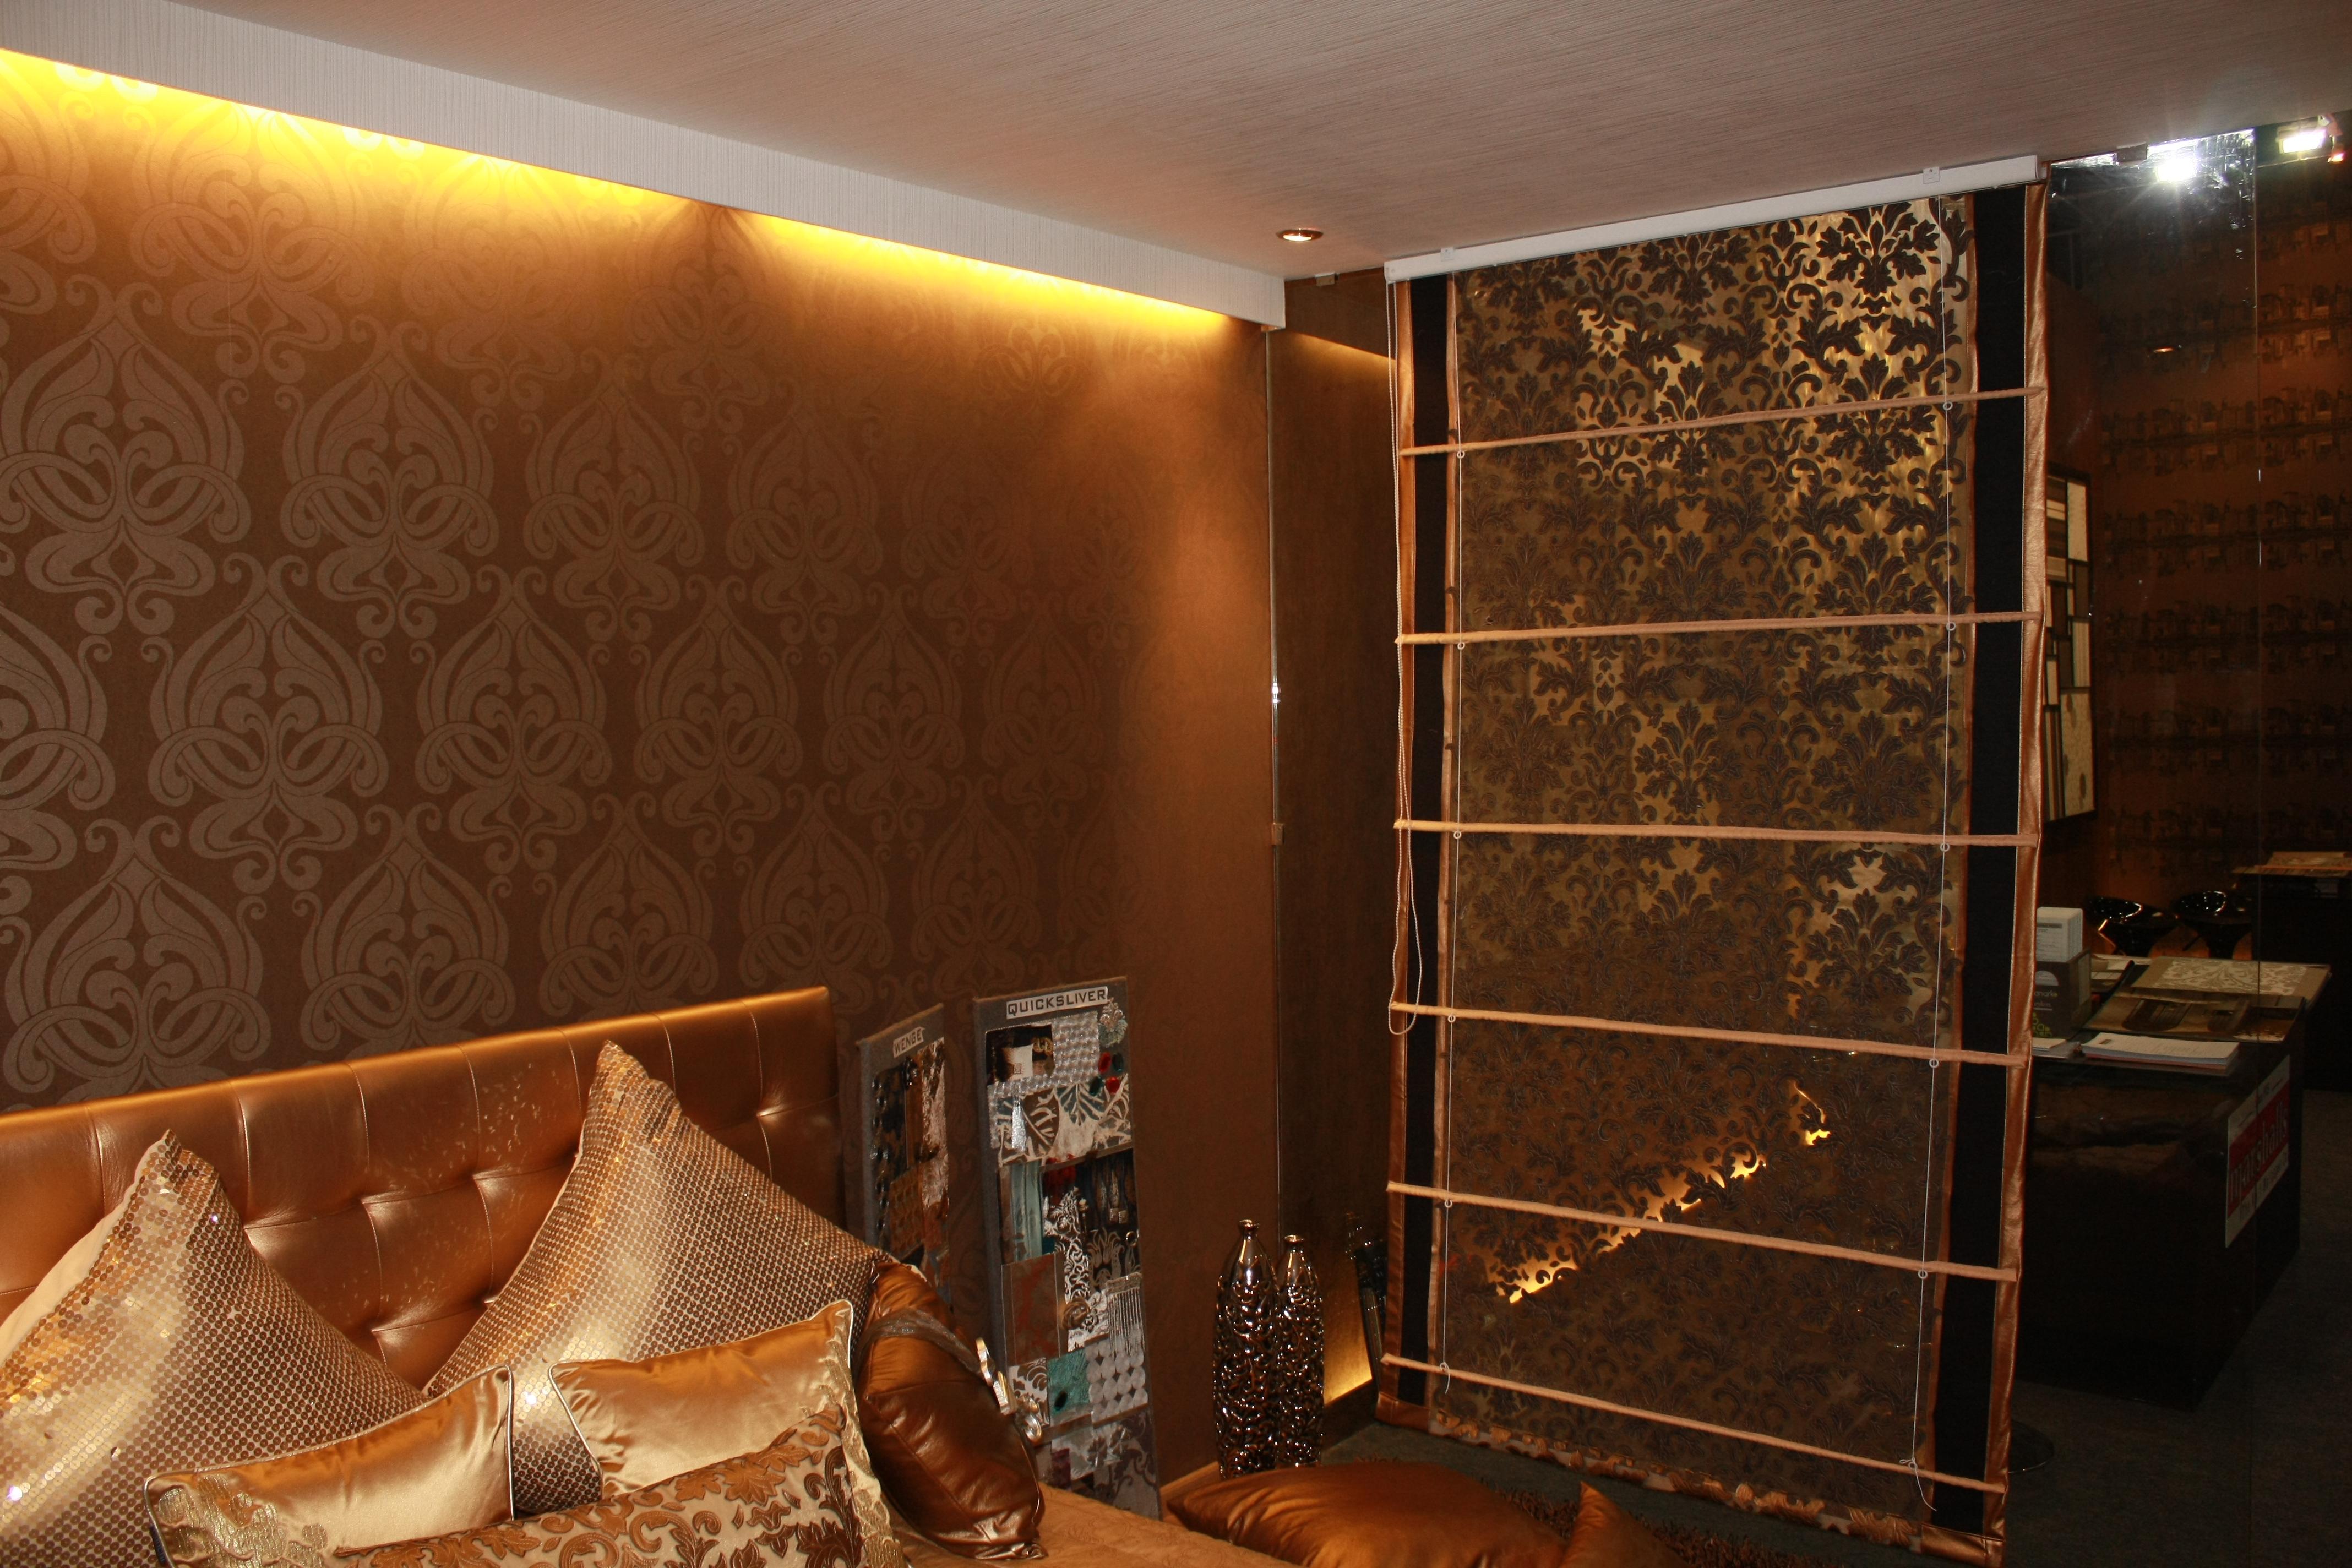 hospitality wallpapers customer care marshalls fashion wallpaper ms 4272x2848